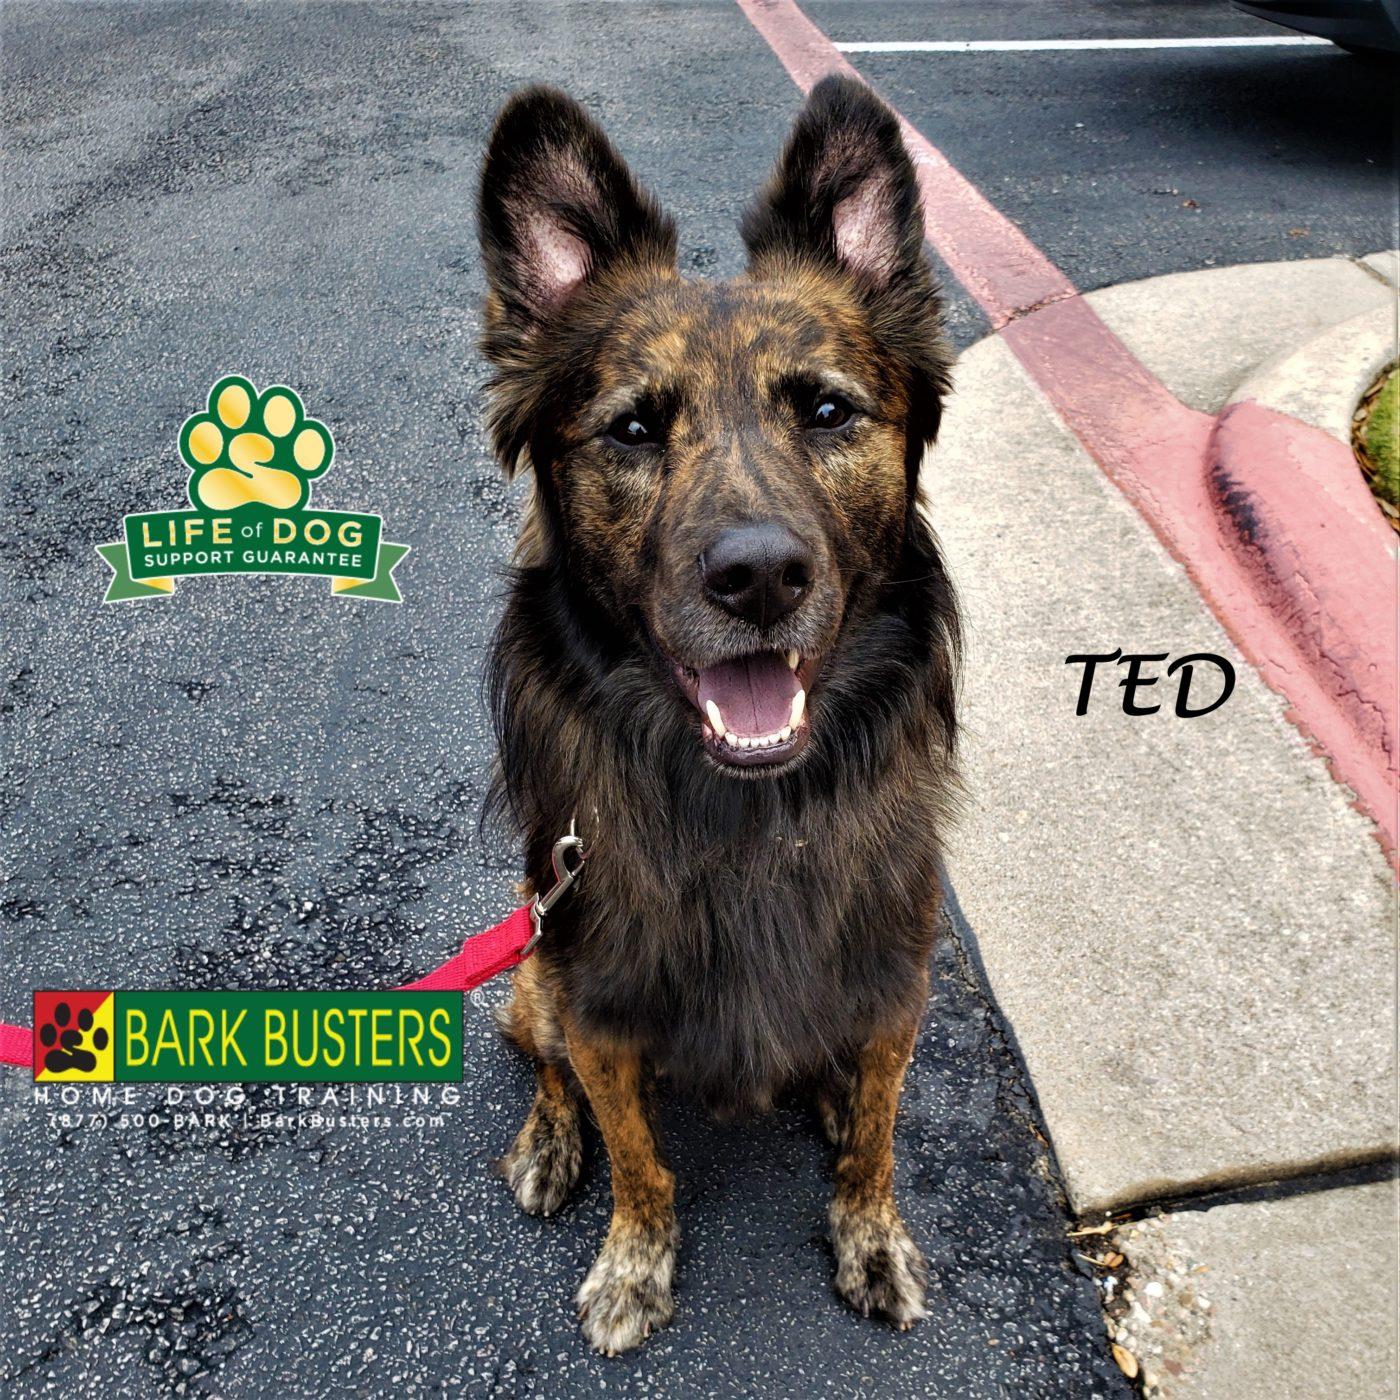 #dutchshepherd #shepherdmix #resourceguarding #leashmanners #obediencetraining #dogtrainingaustin #dogtrainernearme #barkbusters #inhomedogtraining